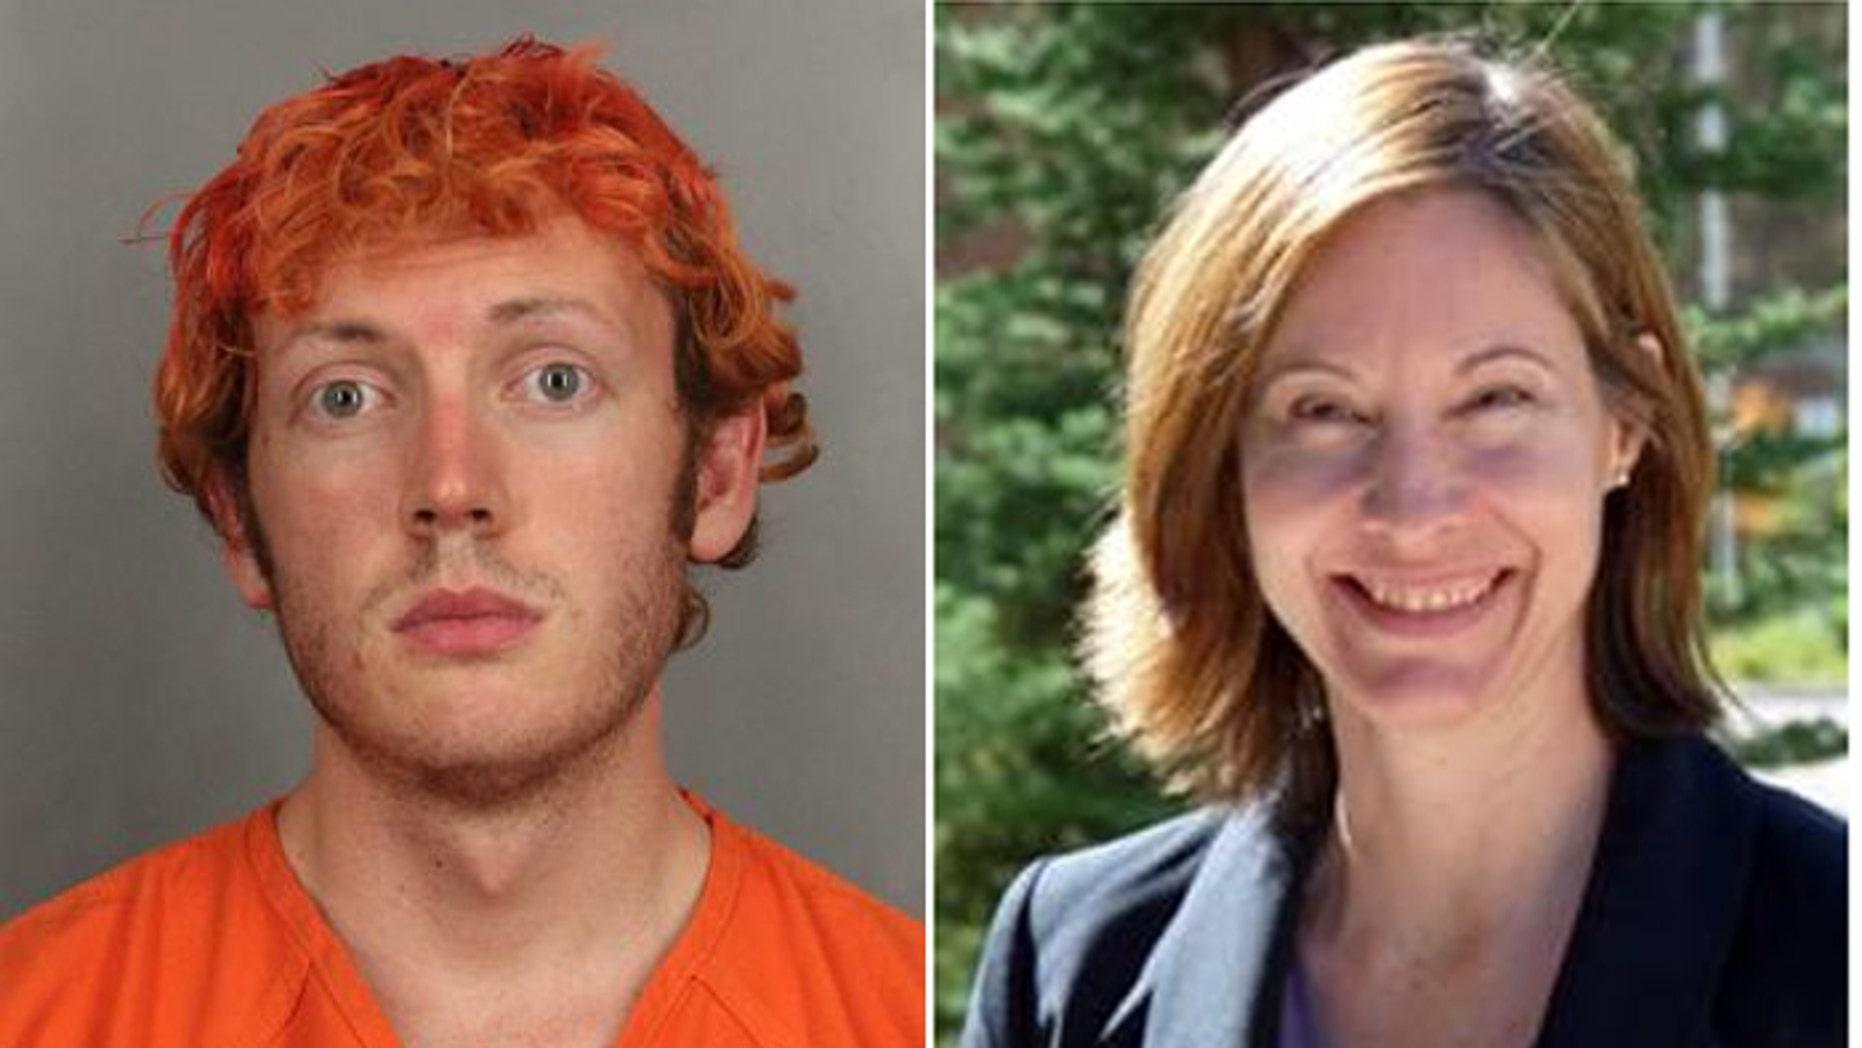 Psychiatrist Lynne Fenton was treating Colorado movie massacre suspect James Holmes.